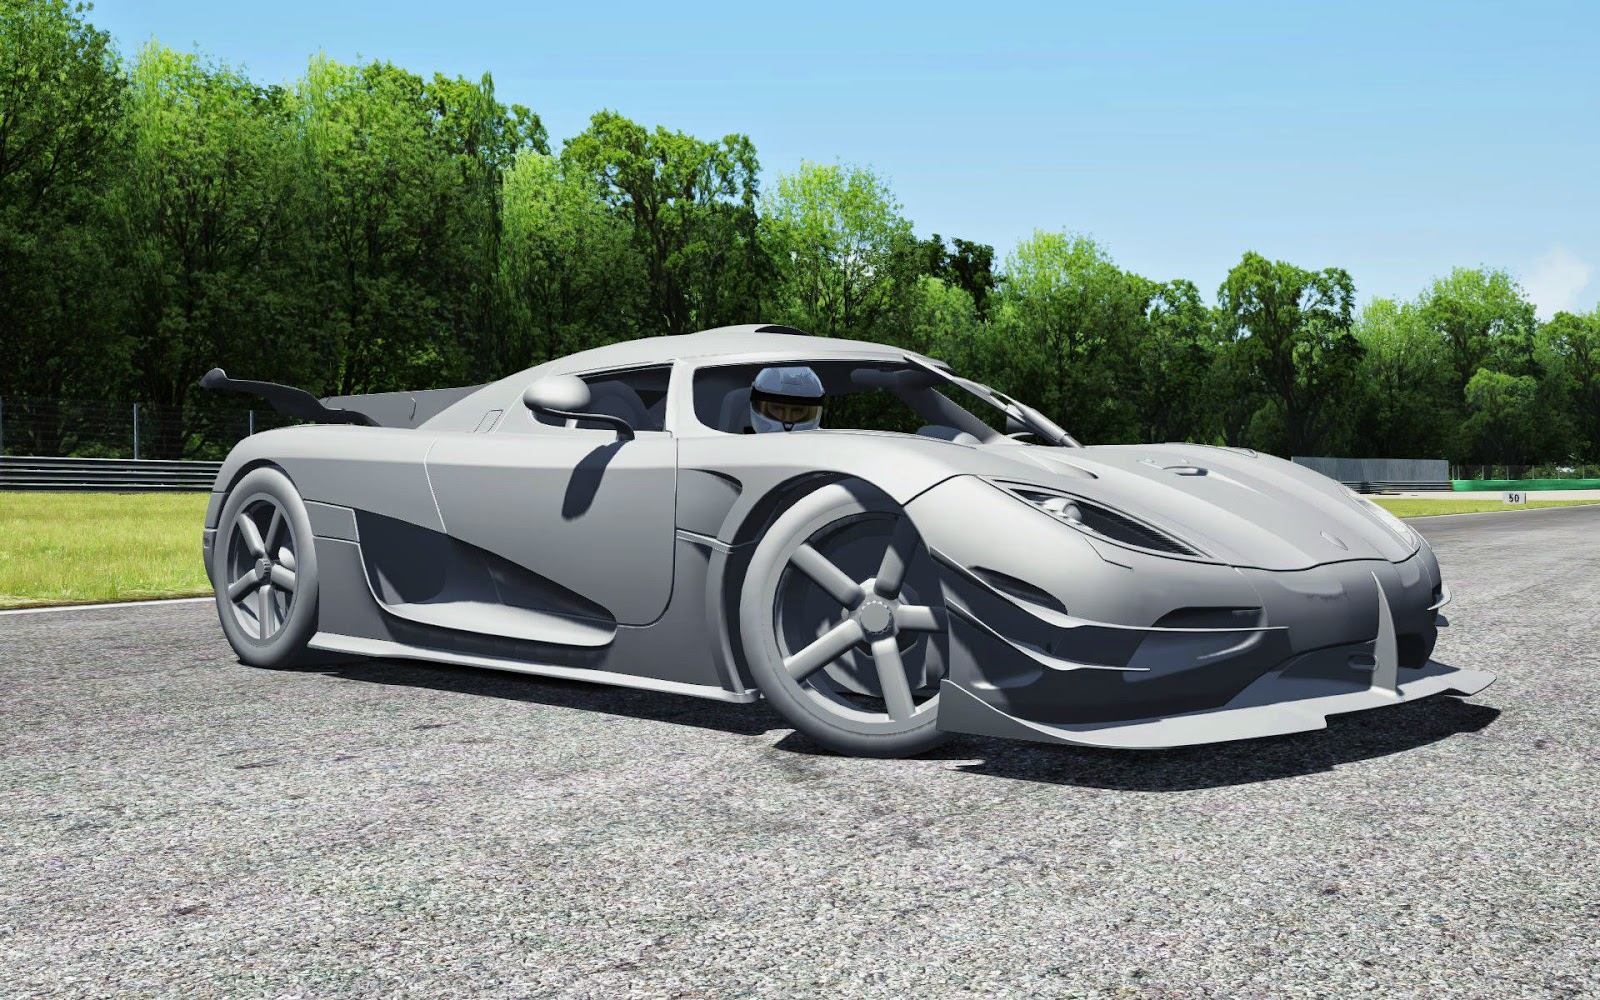 Assetto Corsa Mod Review